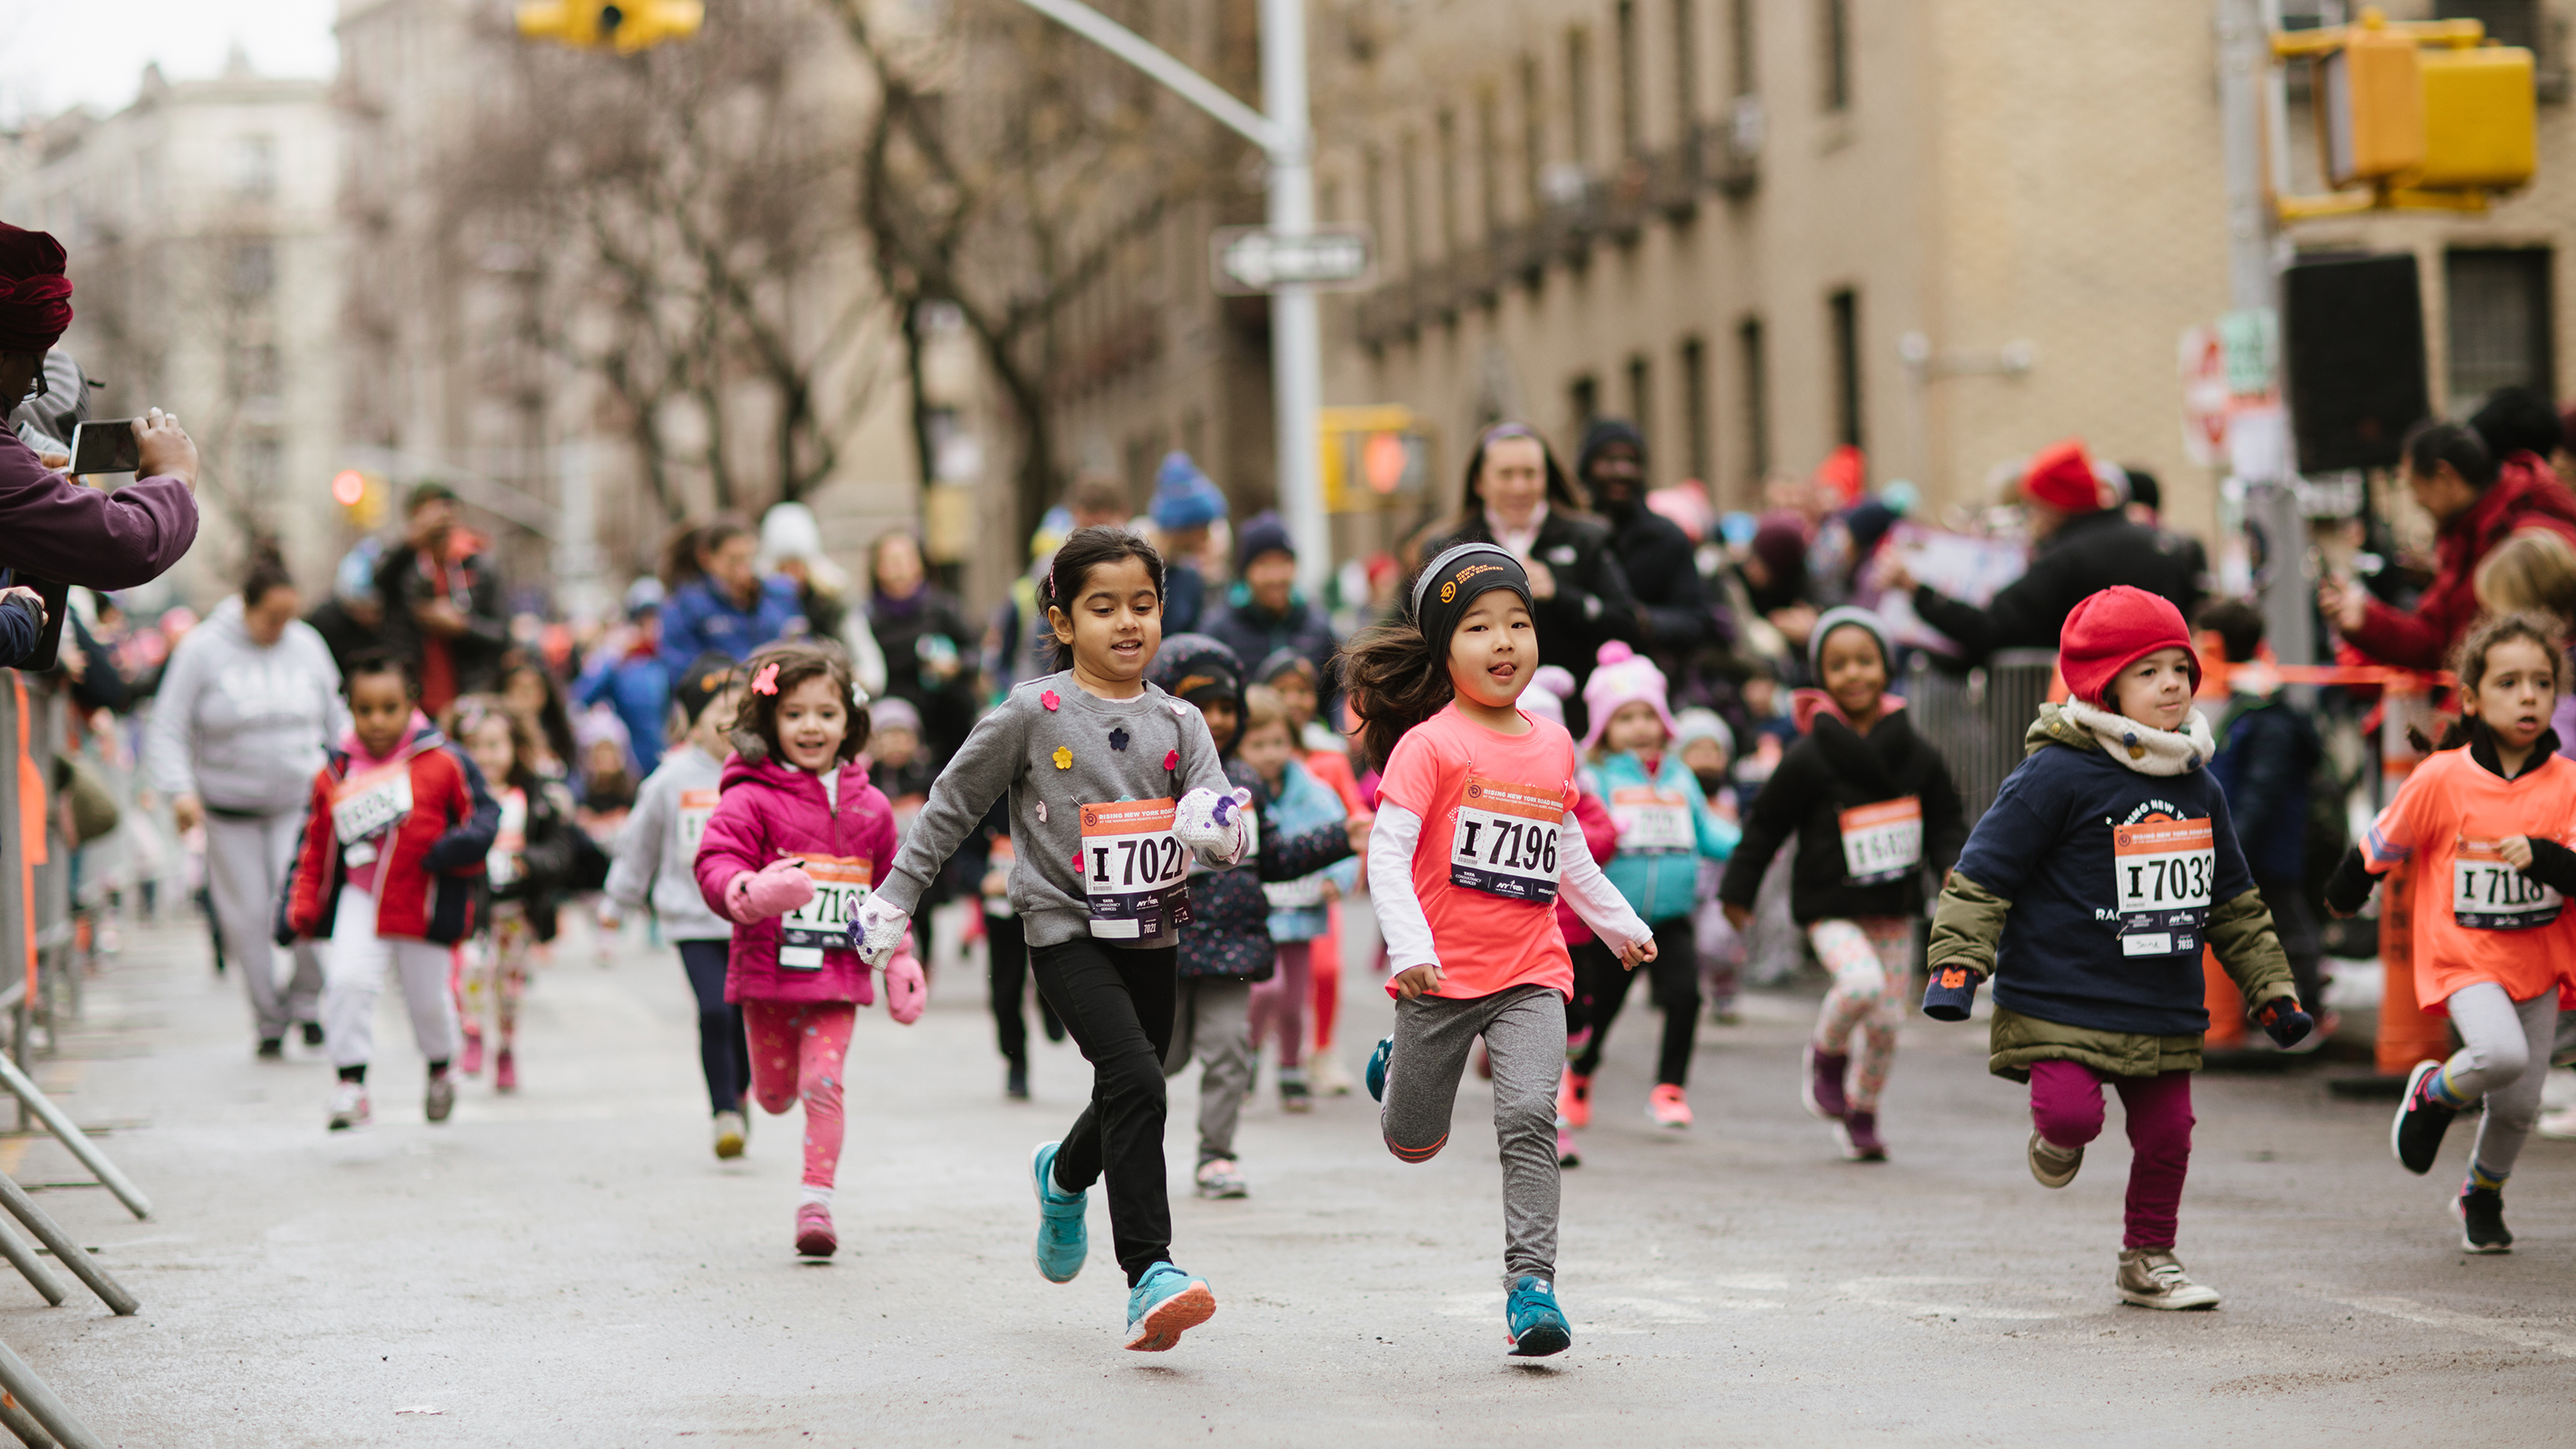 Children racing down the street